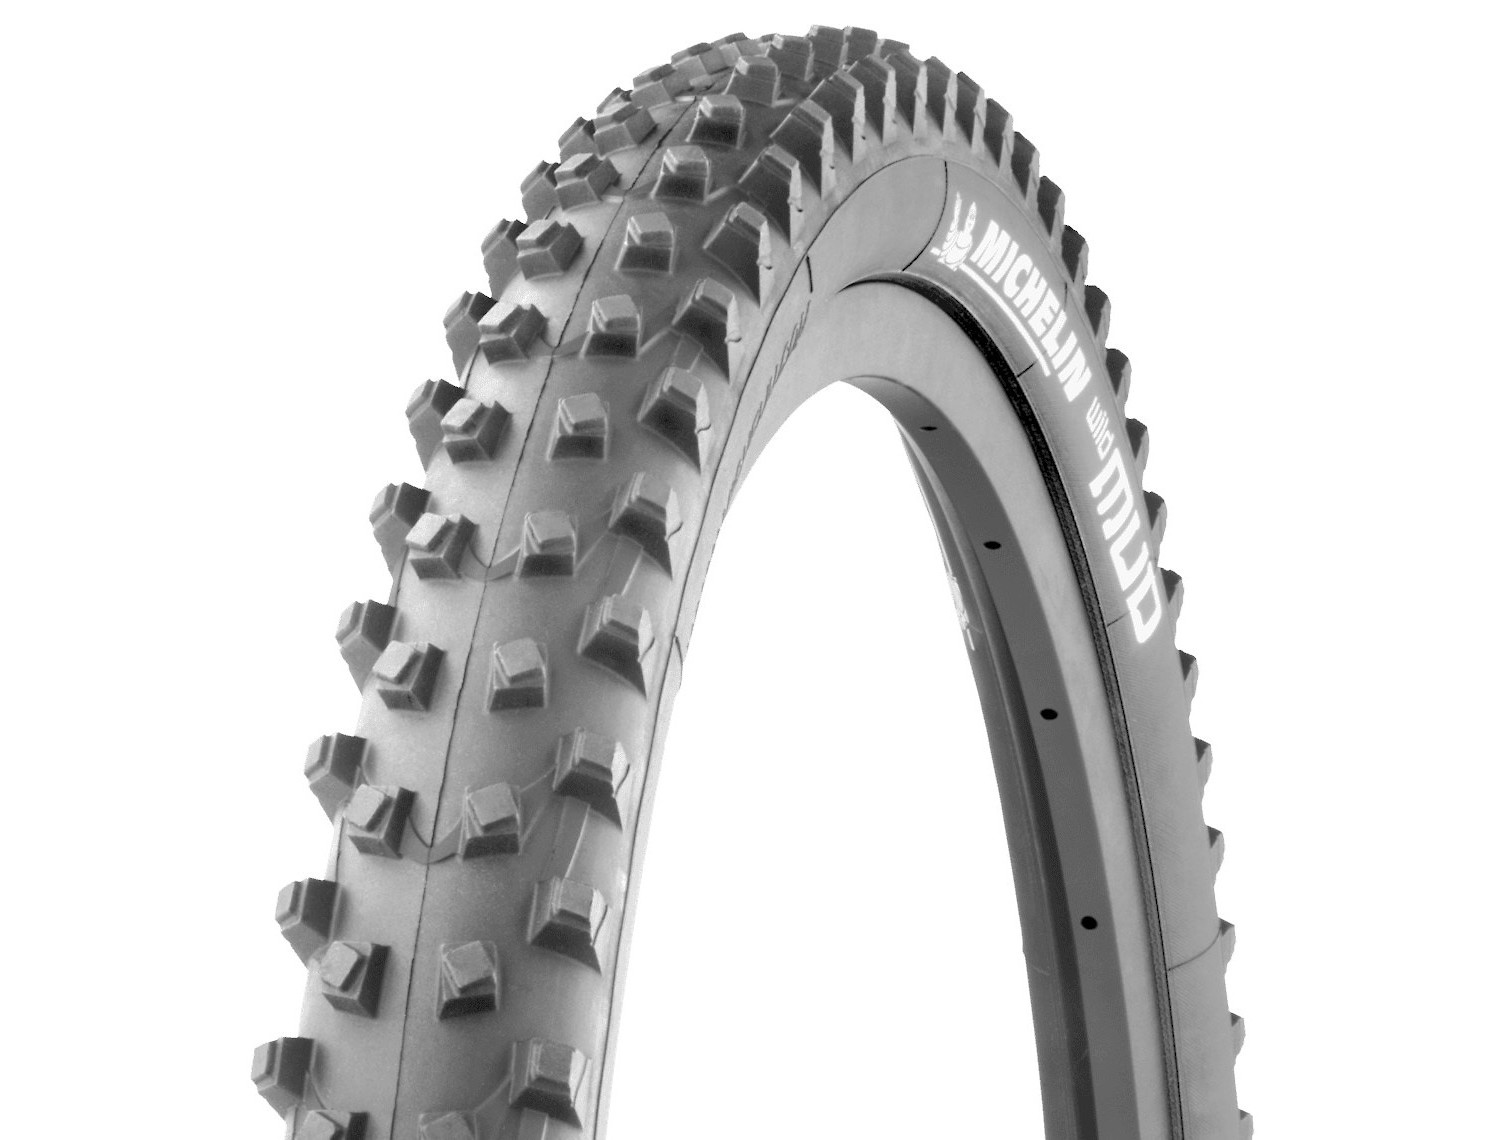 Michelin Wild Mud Advanced Reinforced Tire